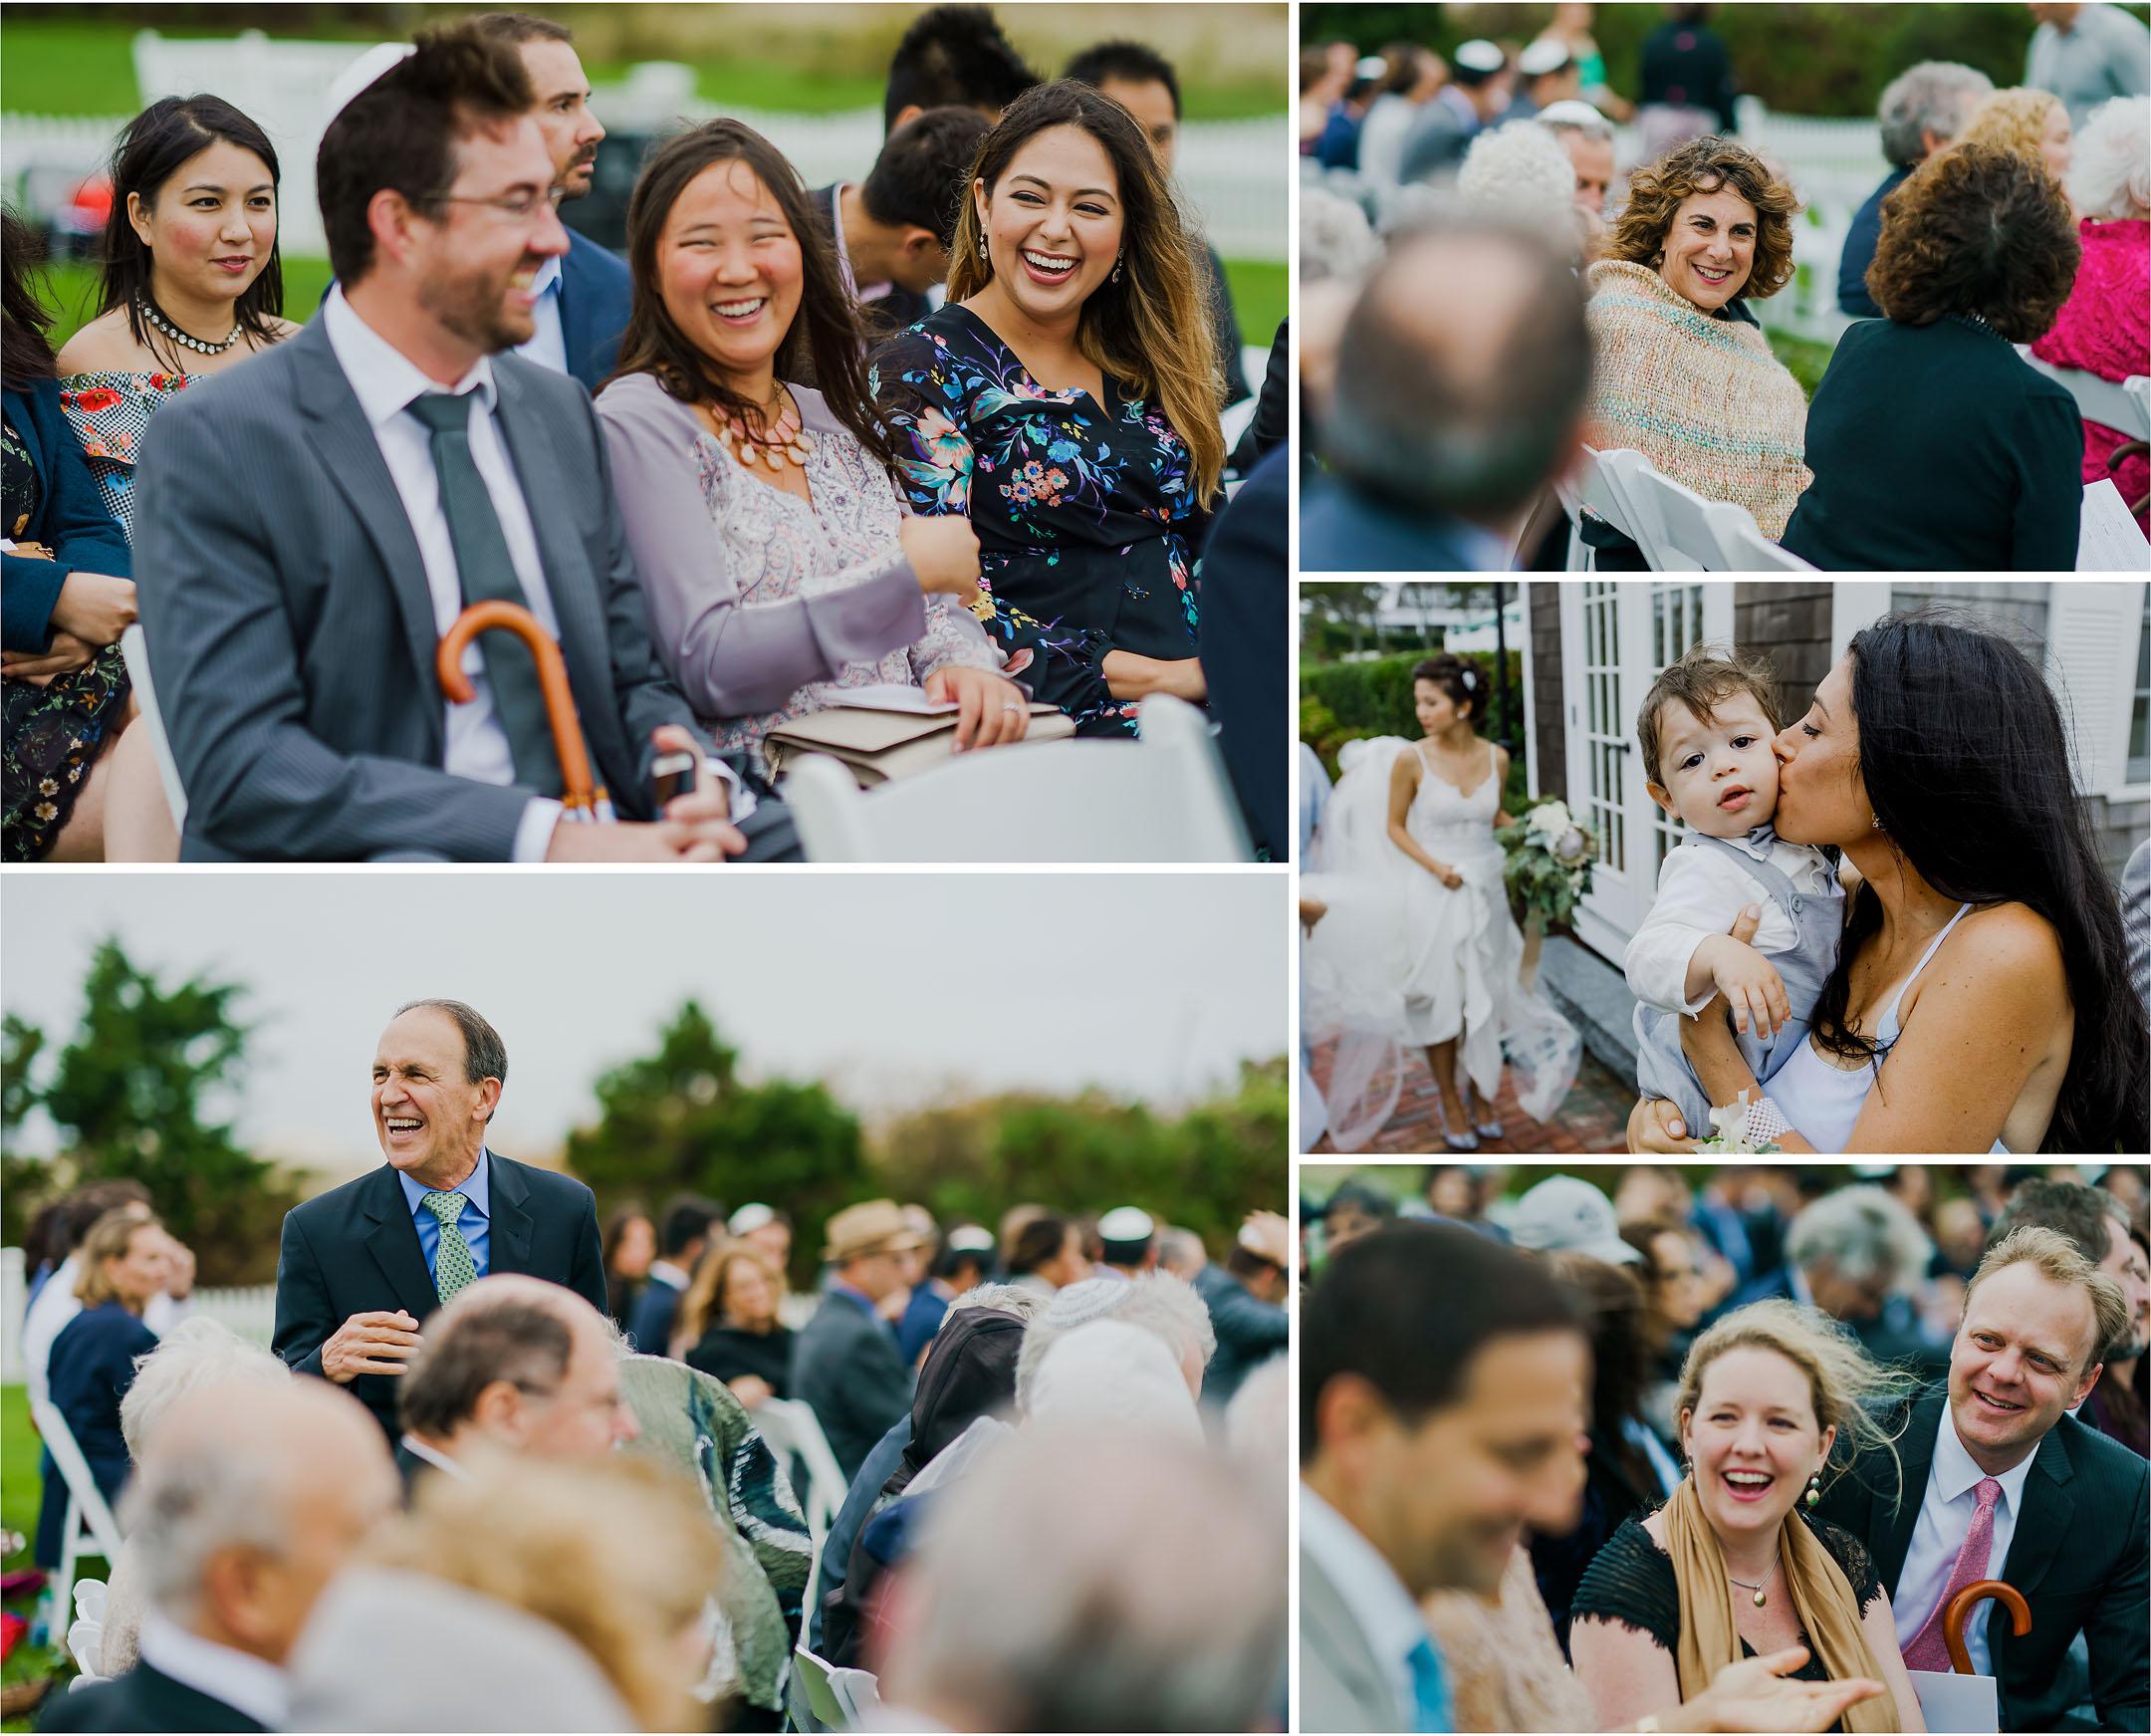 Chatham_Bars_Inn_wedding_25.jpg